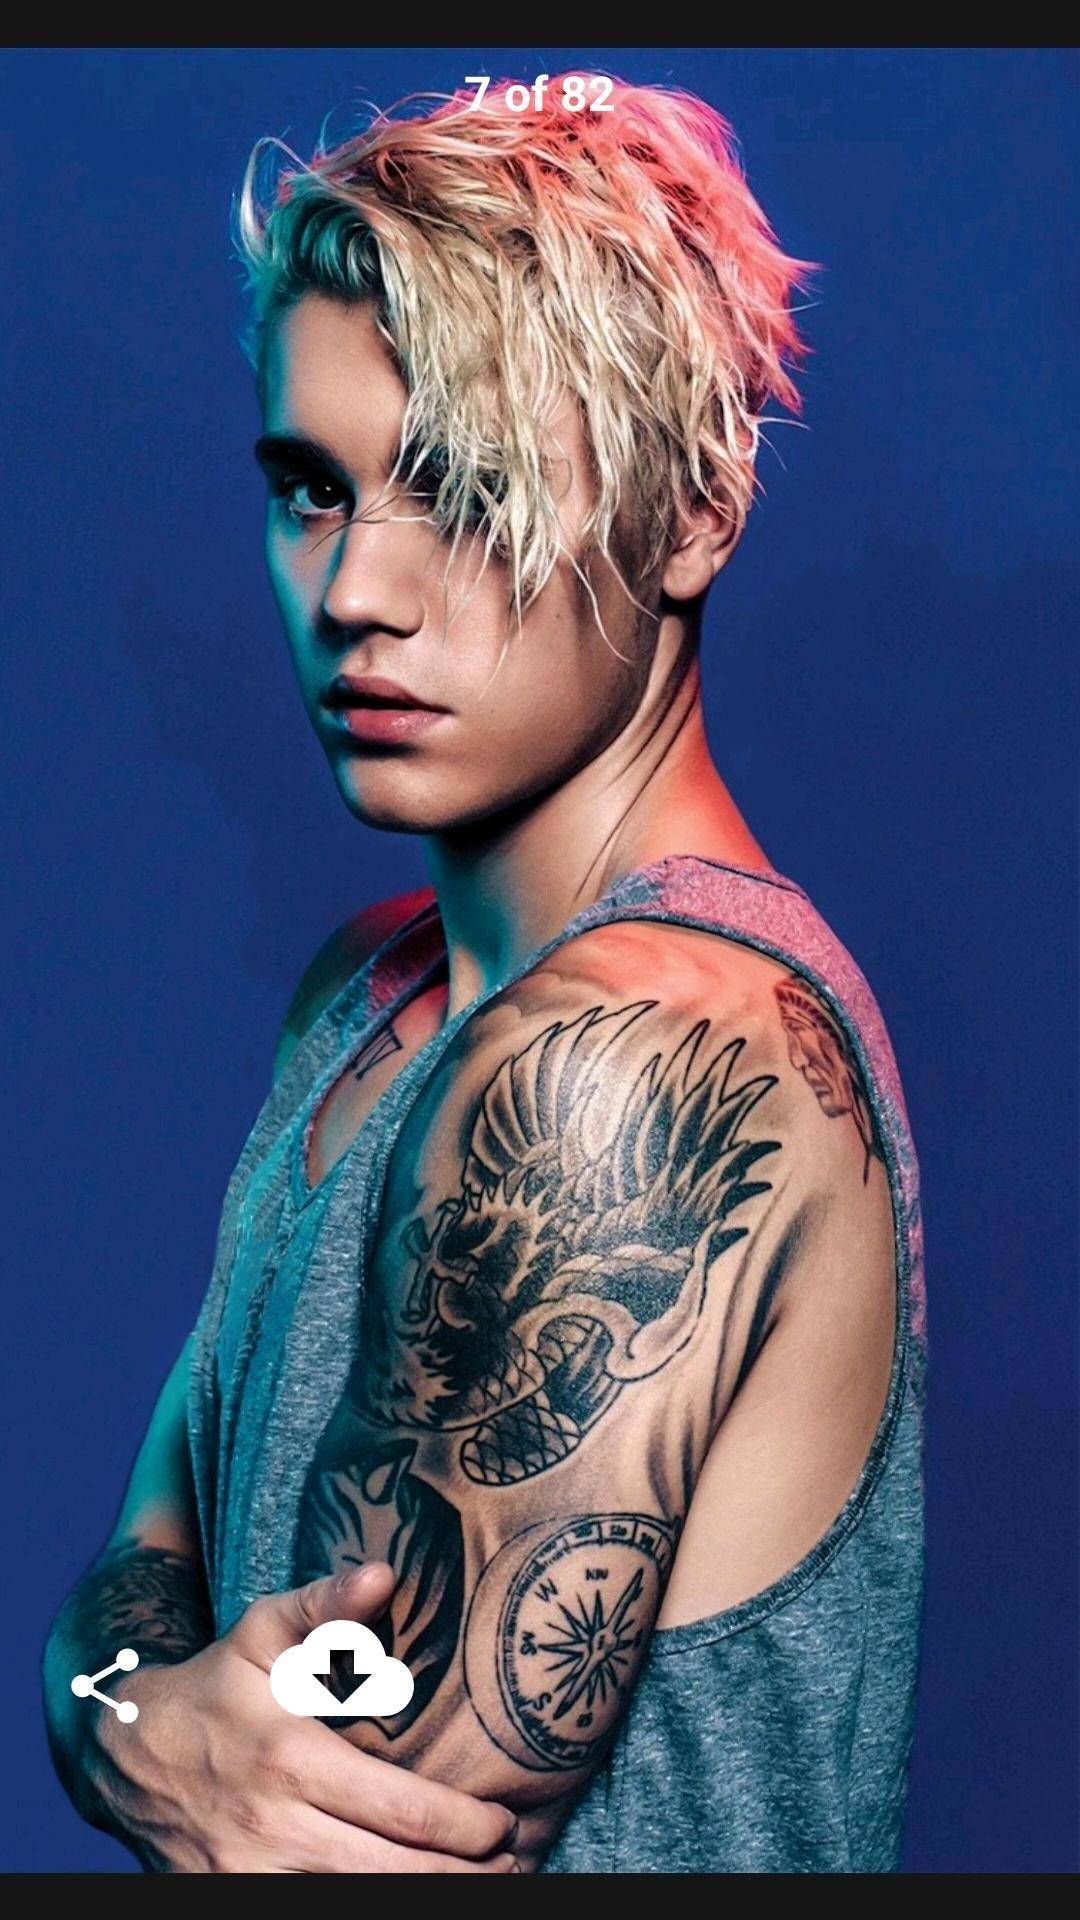 Justin Bieber Wallpaper Mobile Justin Bieber Photoshoot Justin Bieber Wallpaper Justin Bieber Pictures